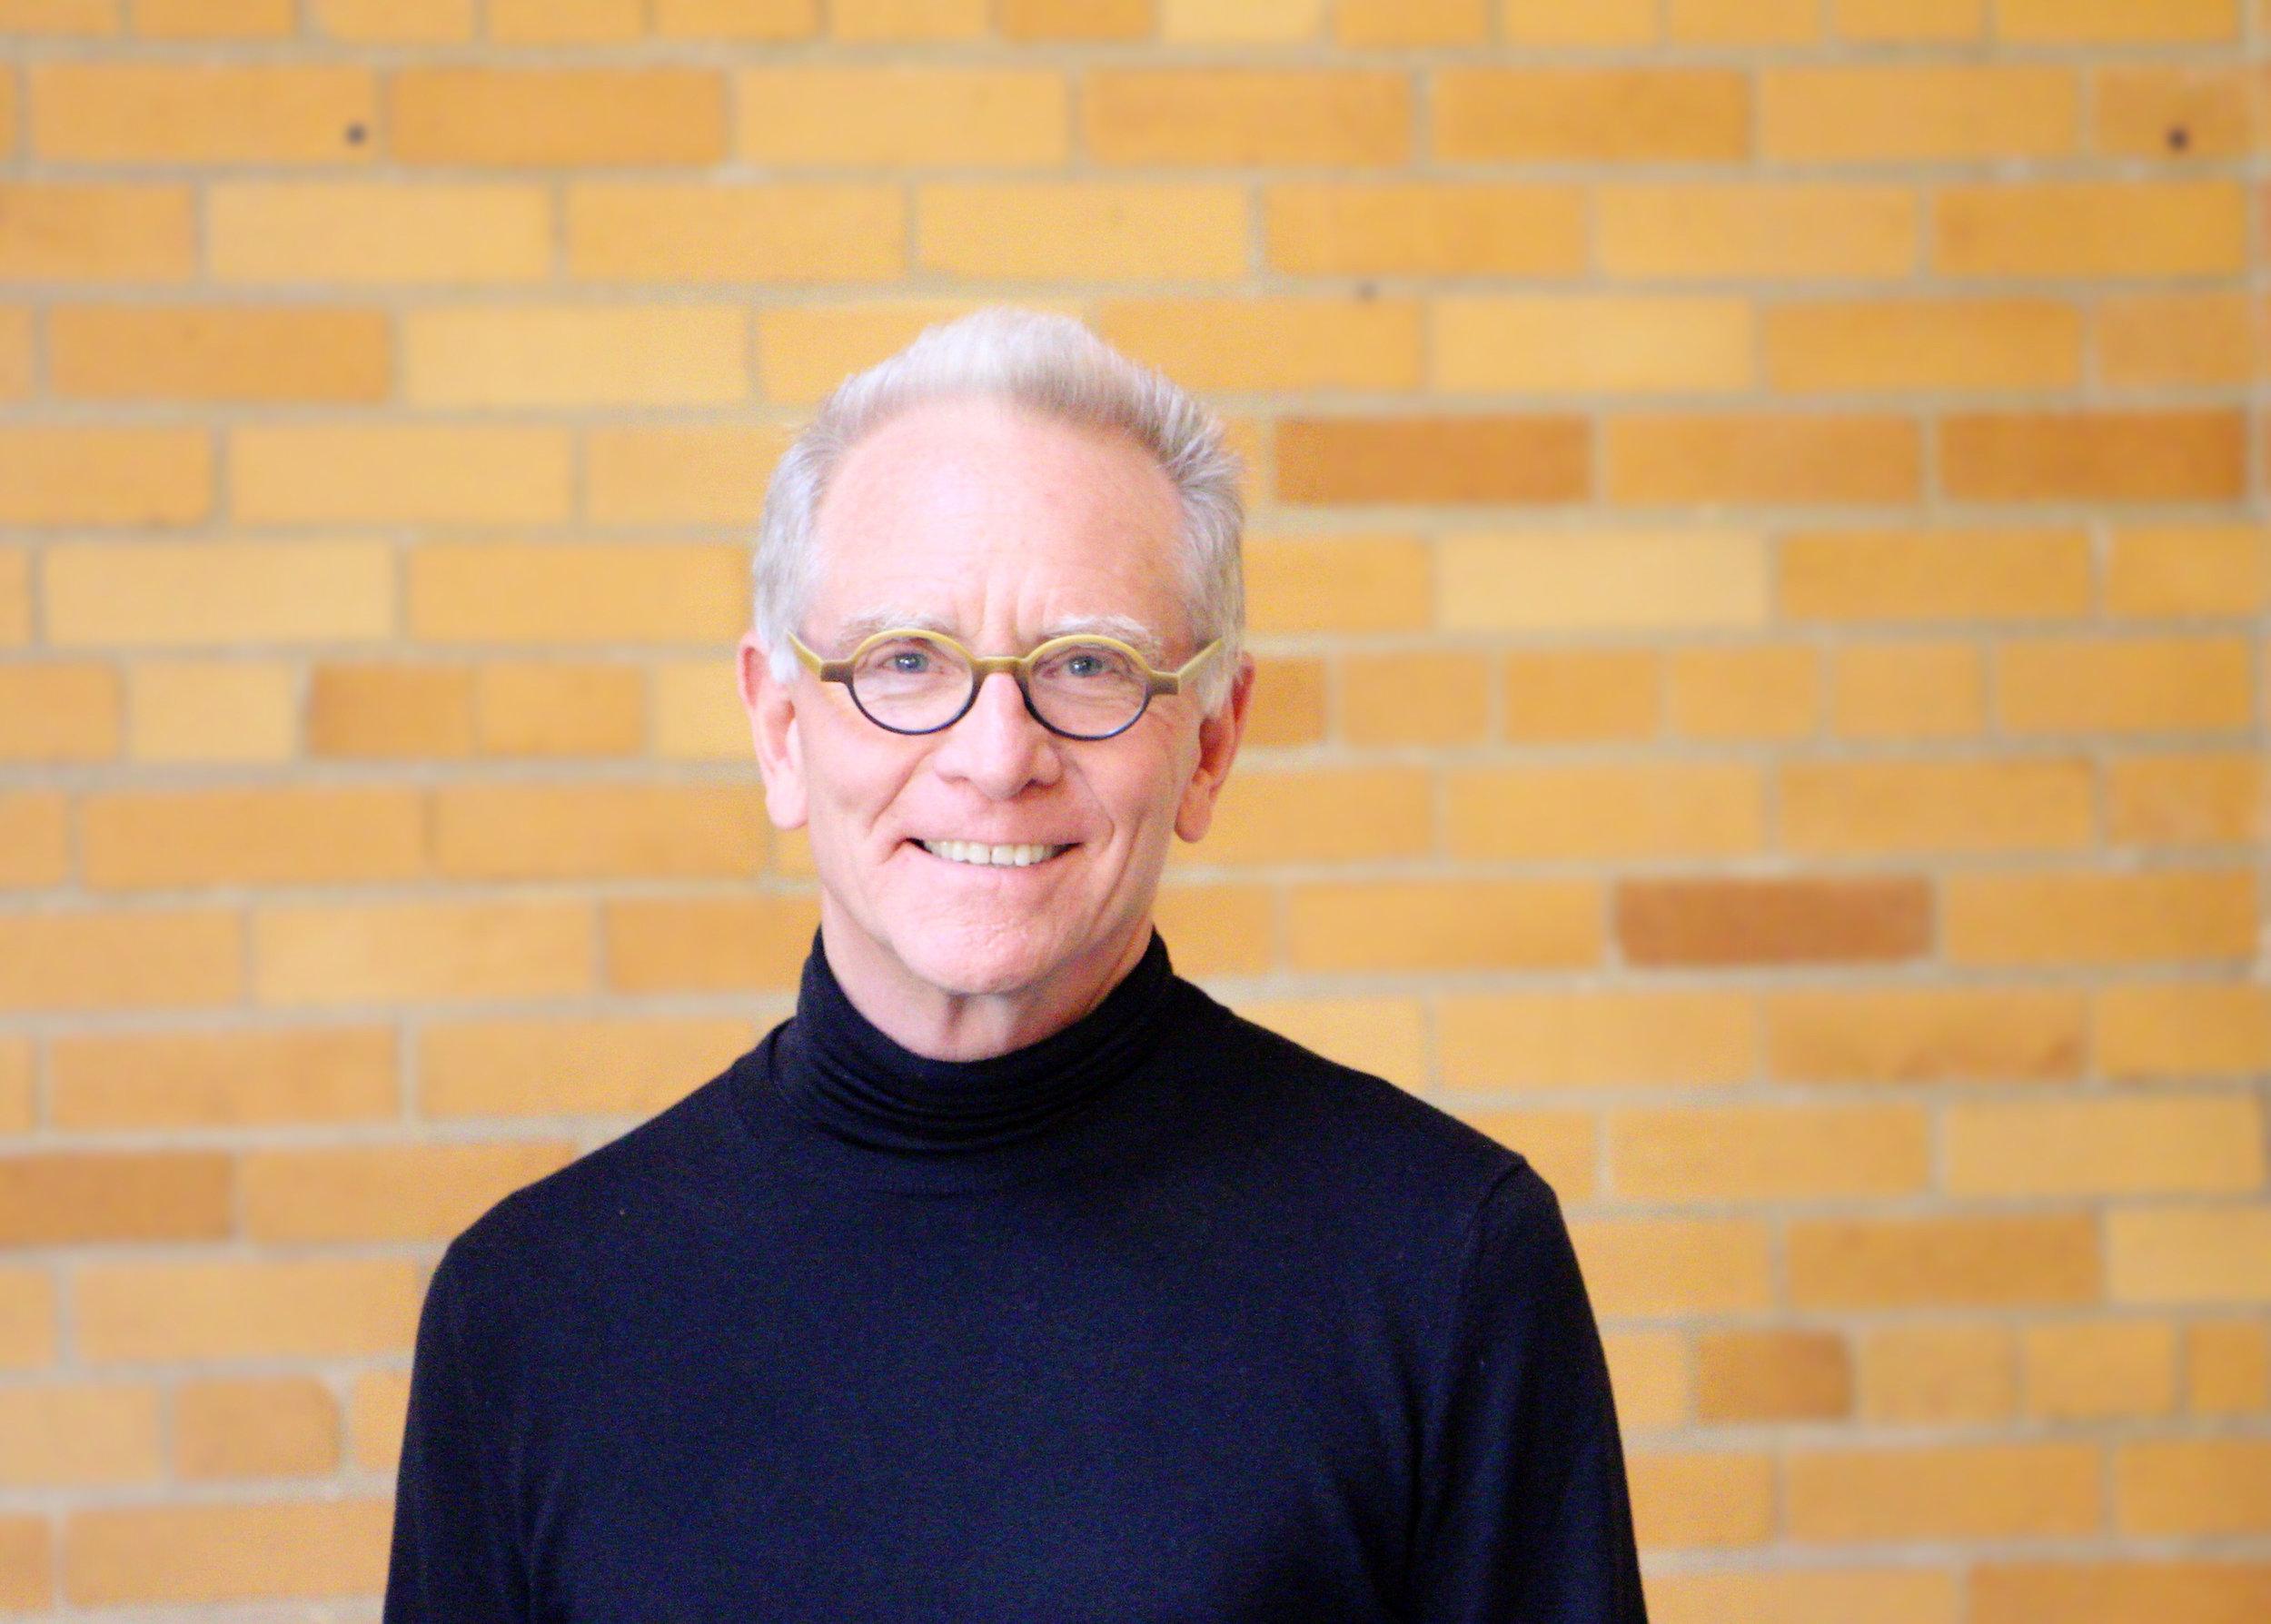 Clark Kellogg - Co-Founder